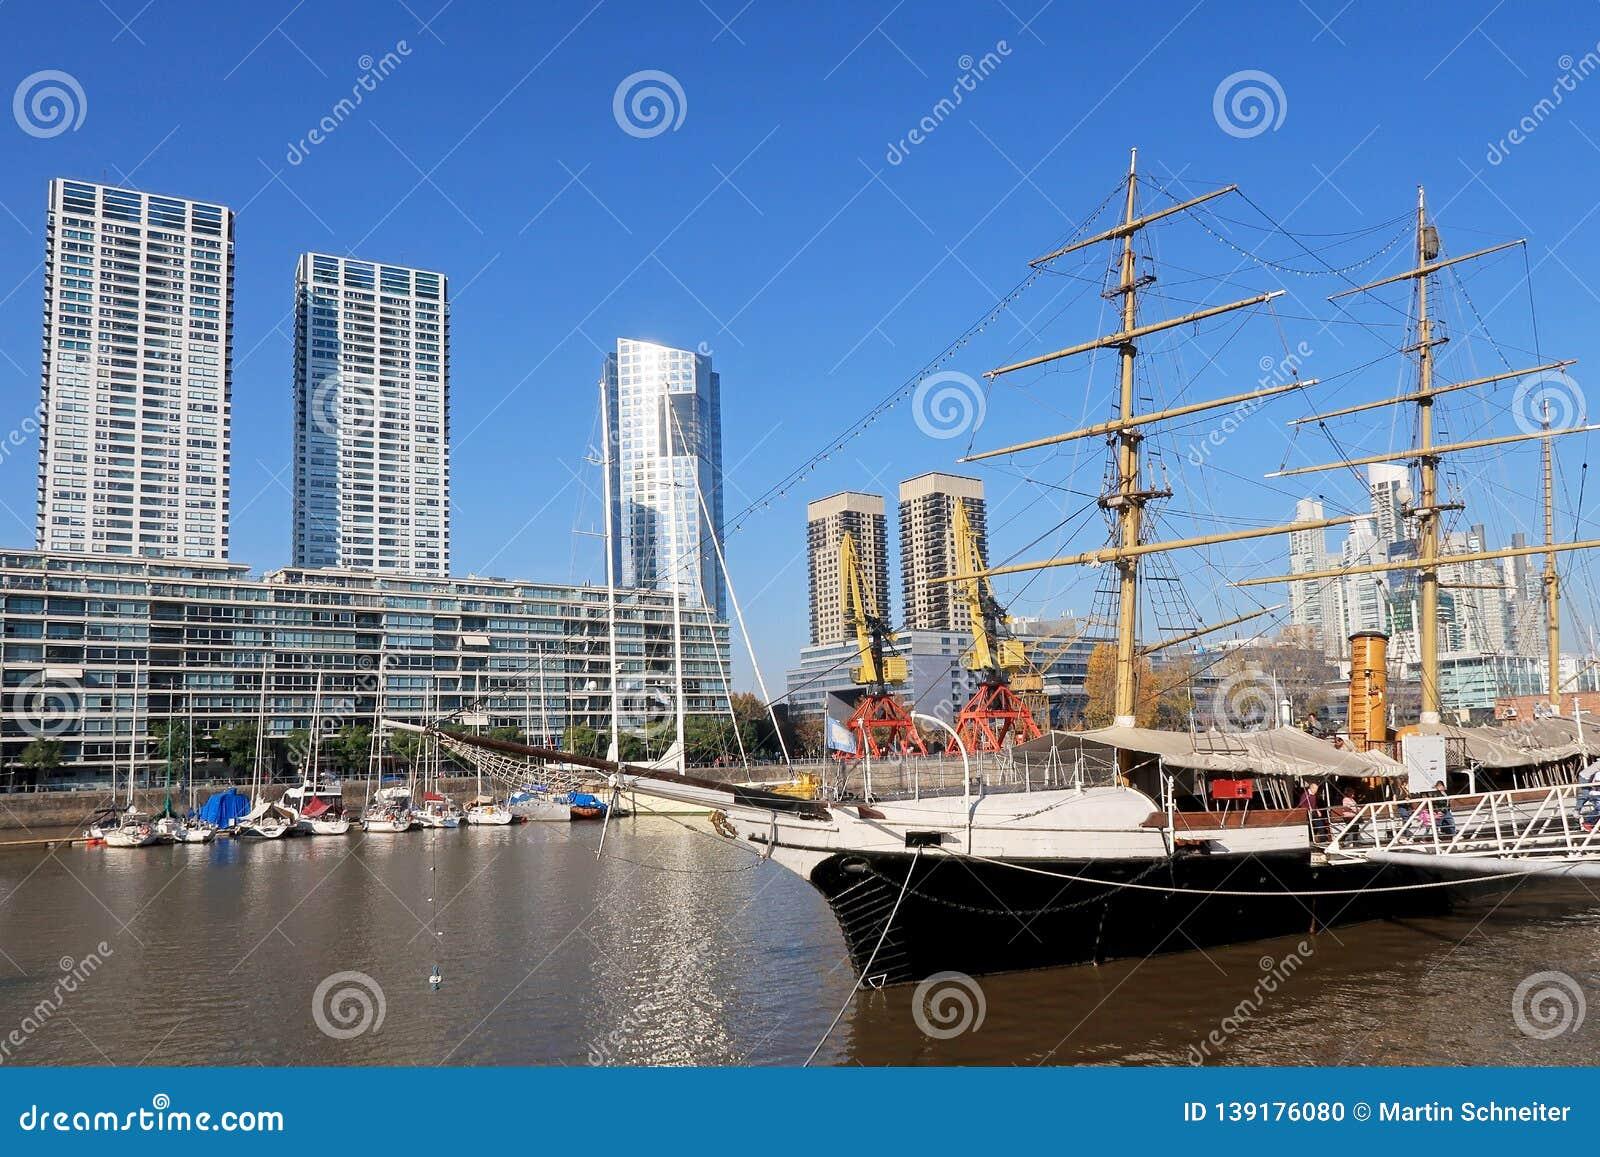 Historic sailing ship on Rio de la Plata river in the modern district Puerto Madero, Buenos Aires, Argentina